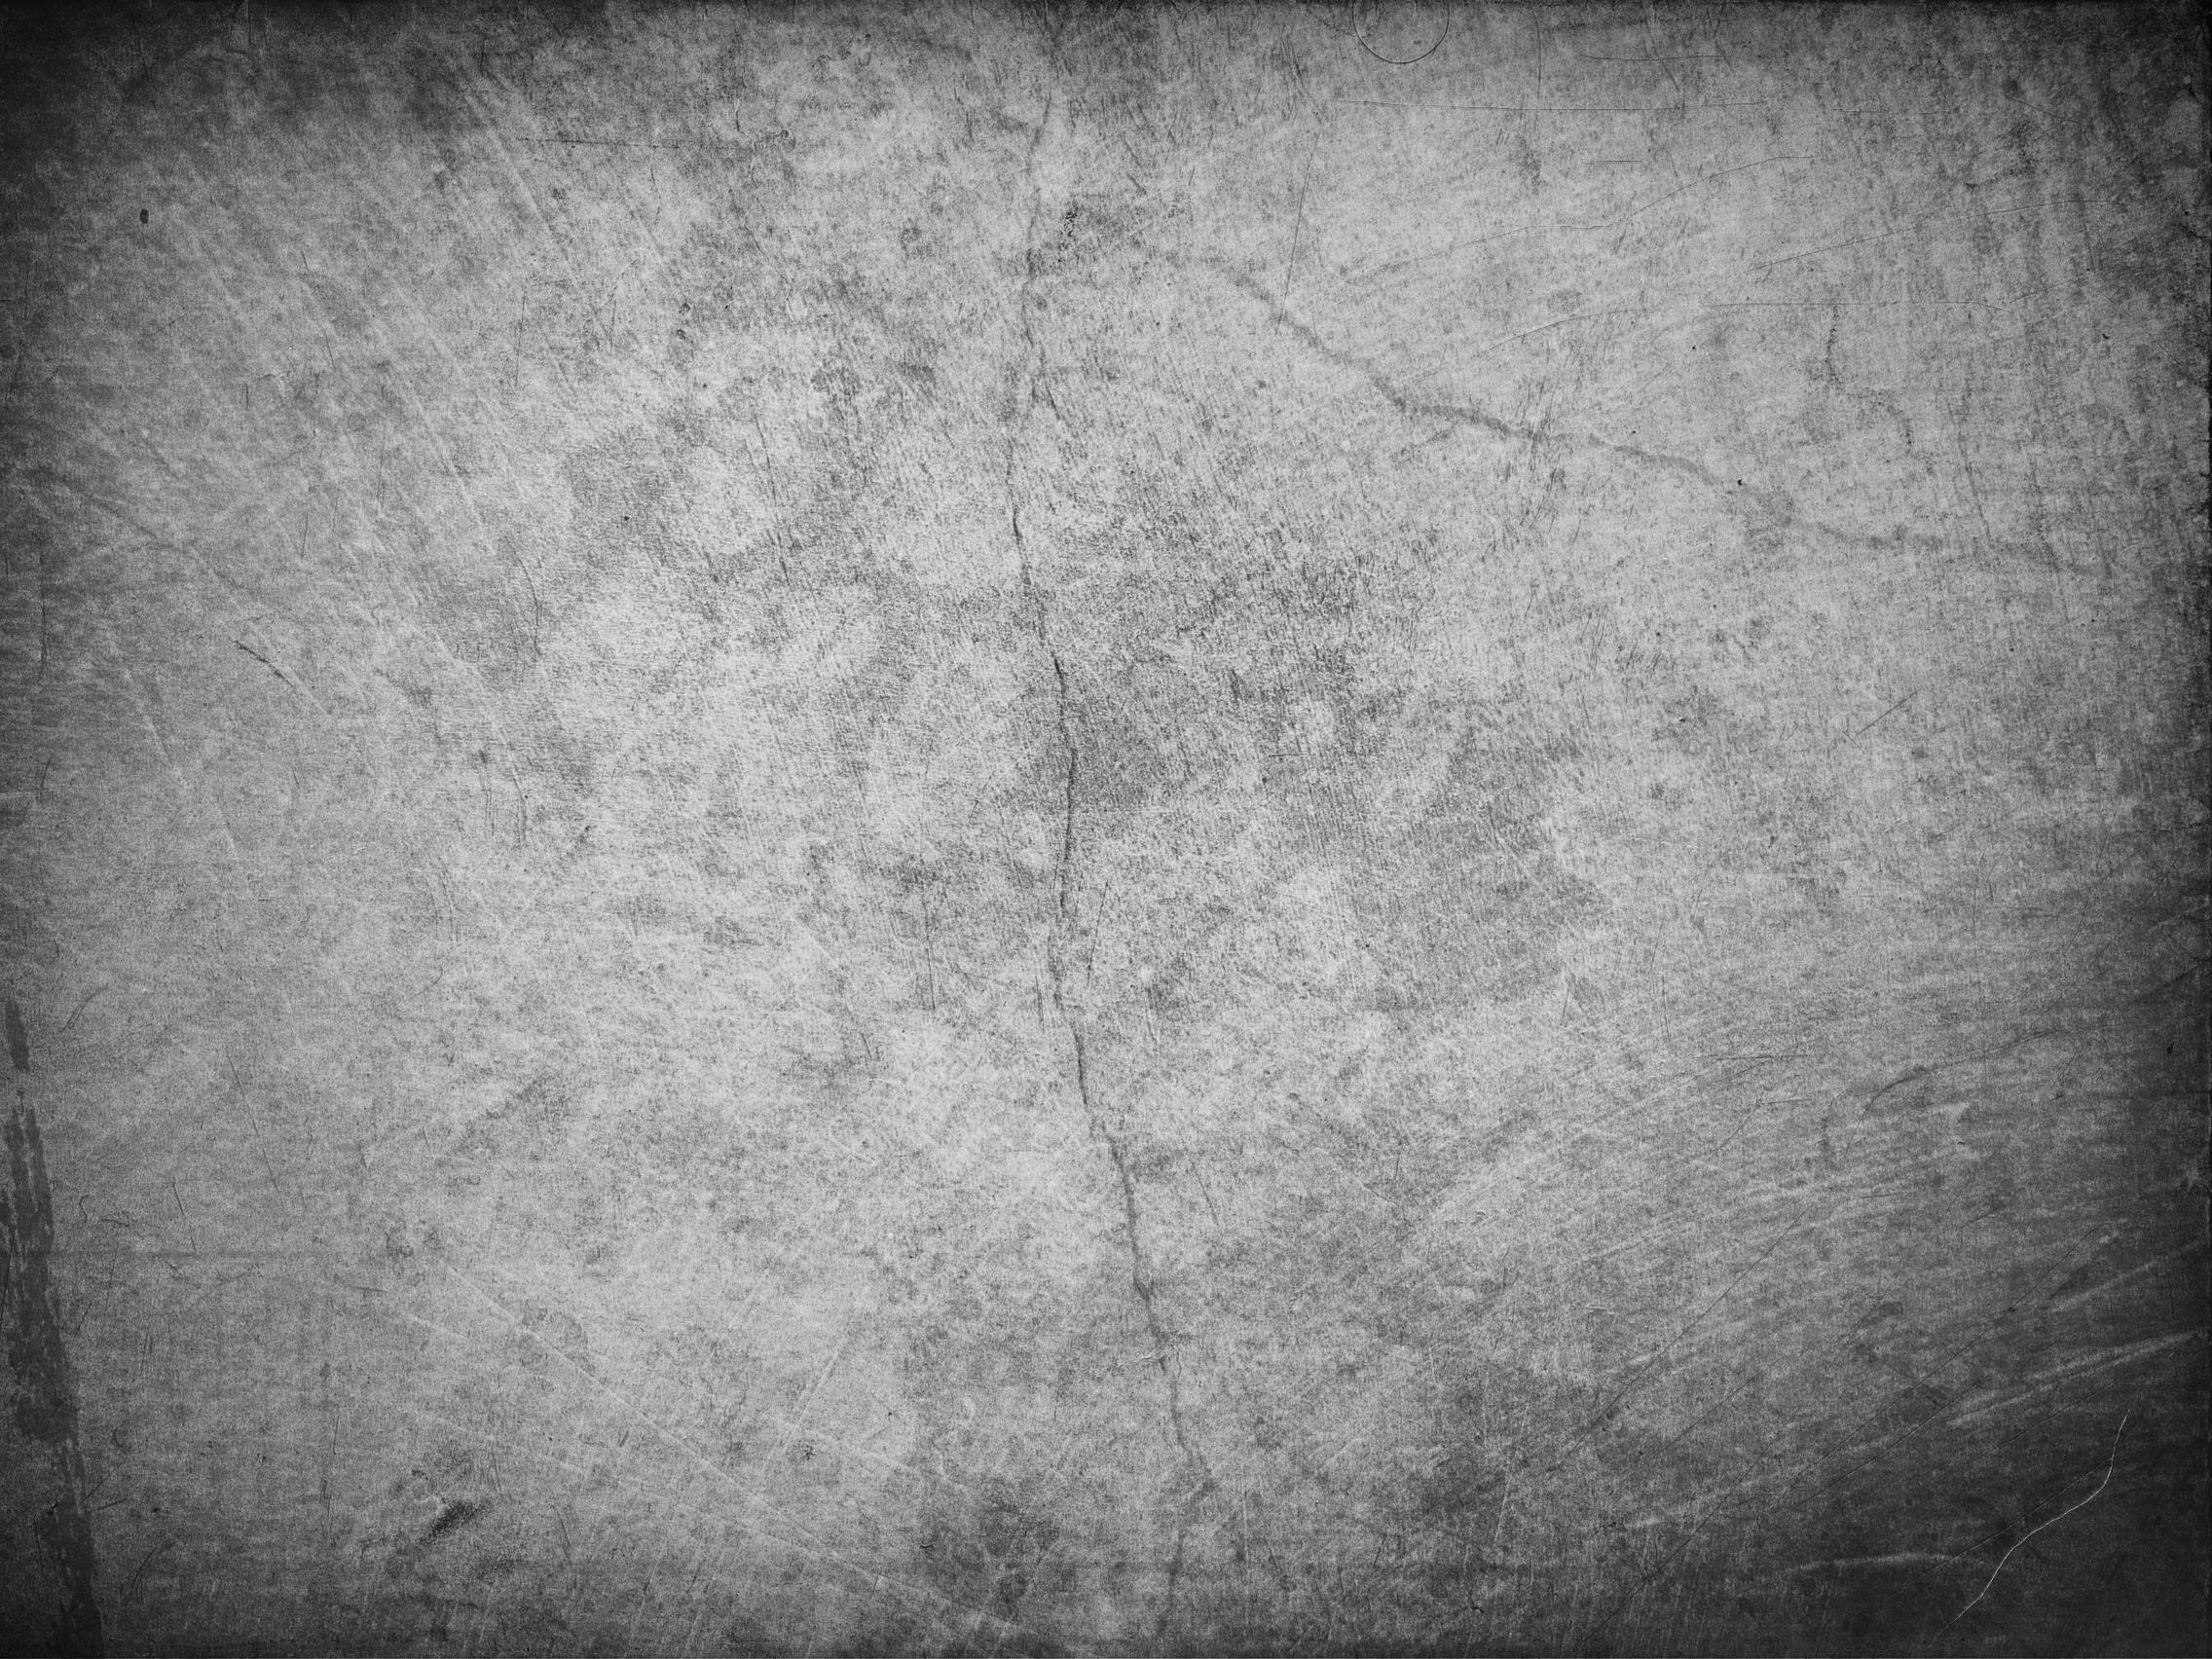 Grunge Texture Wallpaper 2272x1704 Grunge Texture Iii By 2272x1704